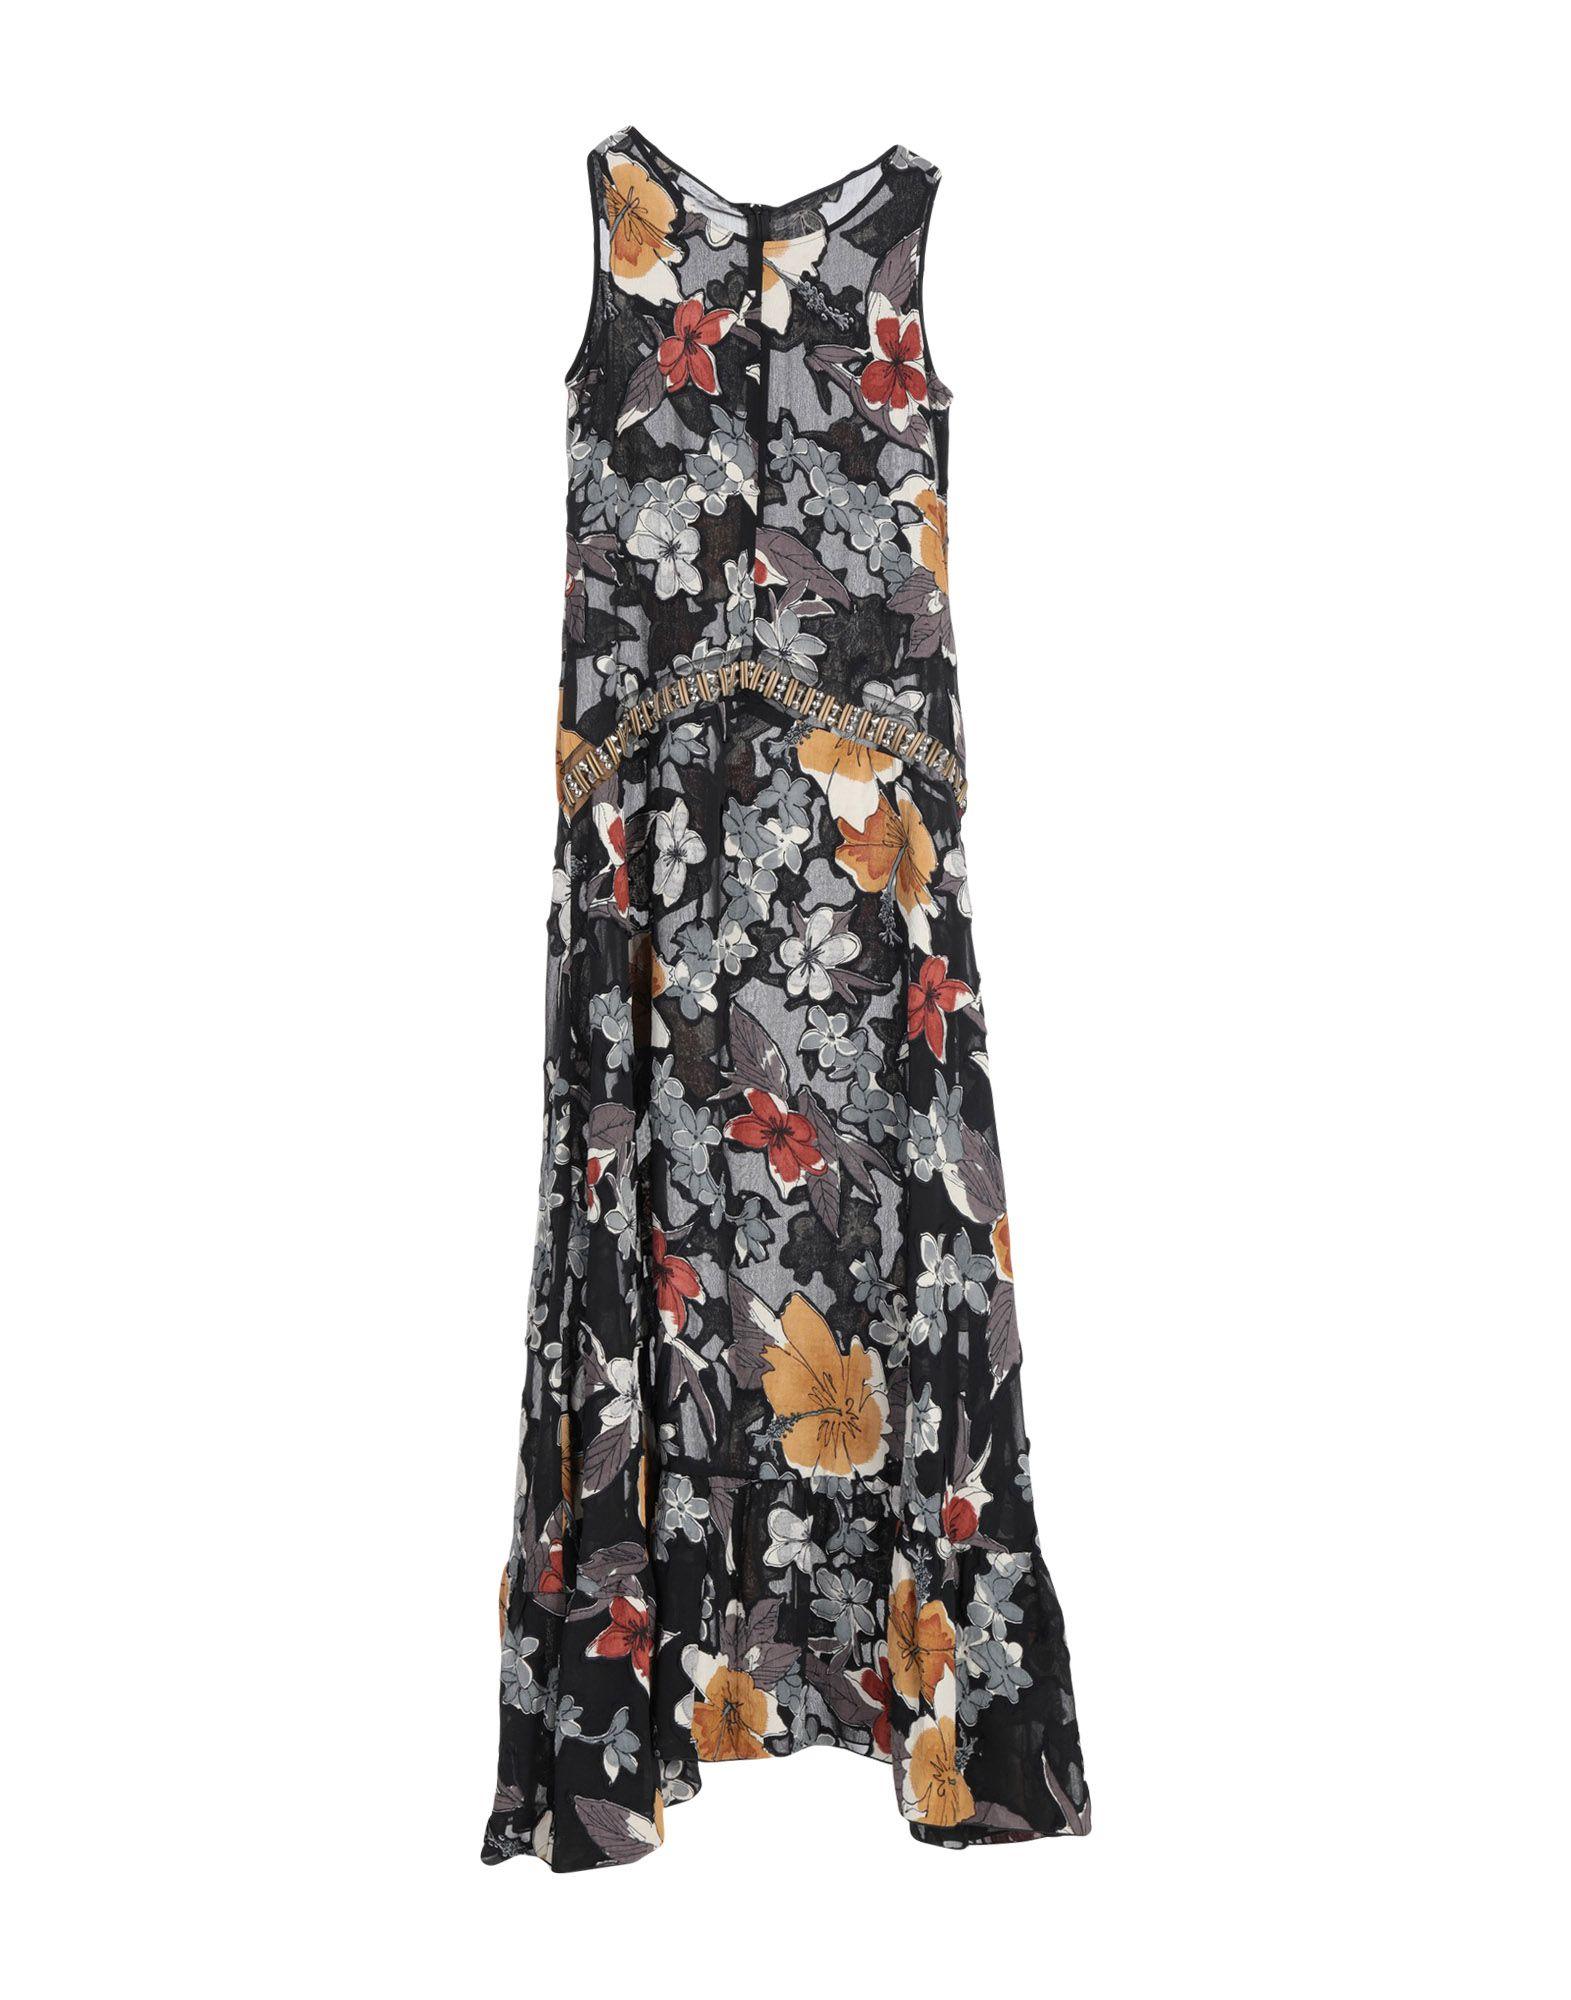 LE RAGAZZE DI ST. BARTH Длинное платье